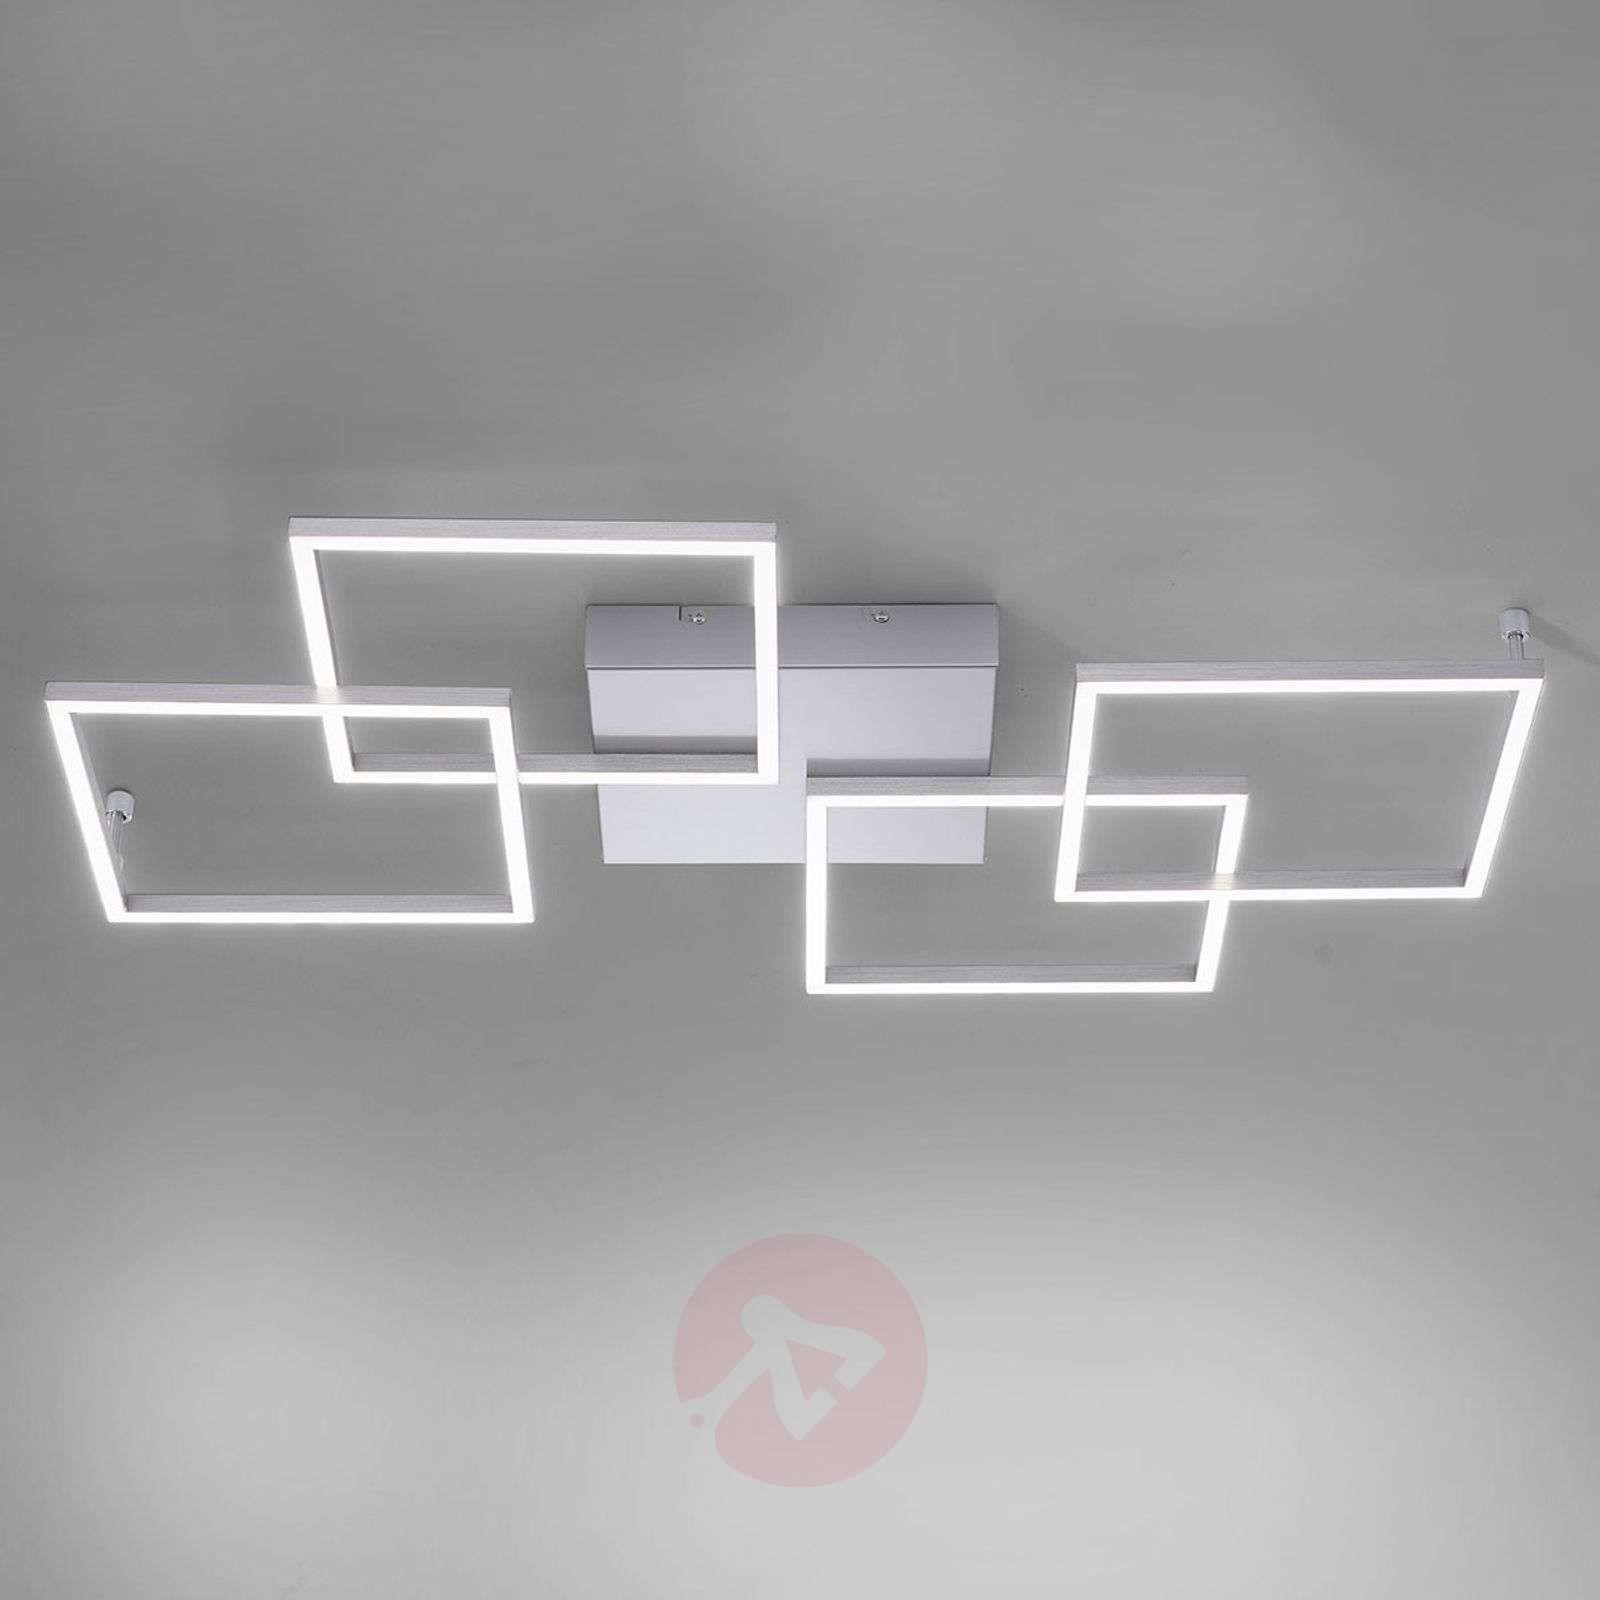 ściemniana Lampa Sufitowa Led Quadra 4 Punktowa Lampy